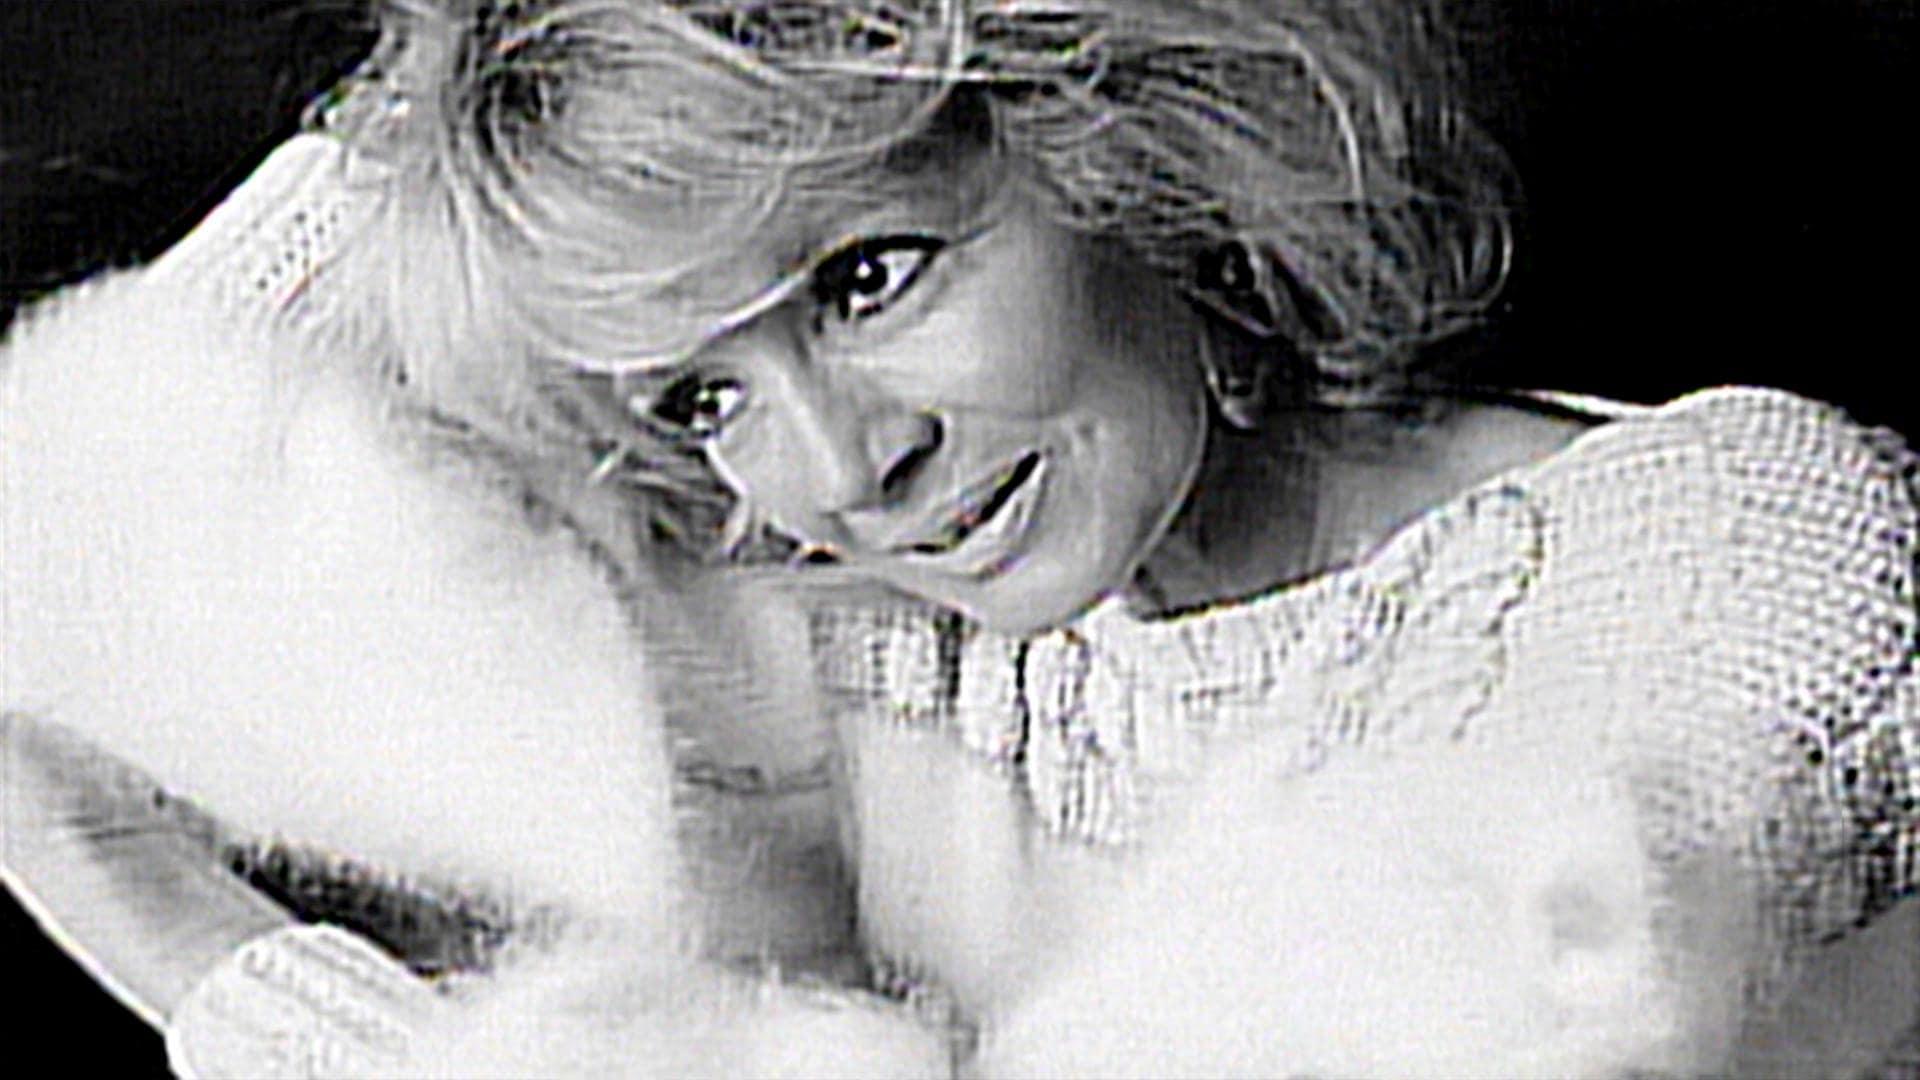 Angie Dickinson: December 12, 1987